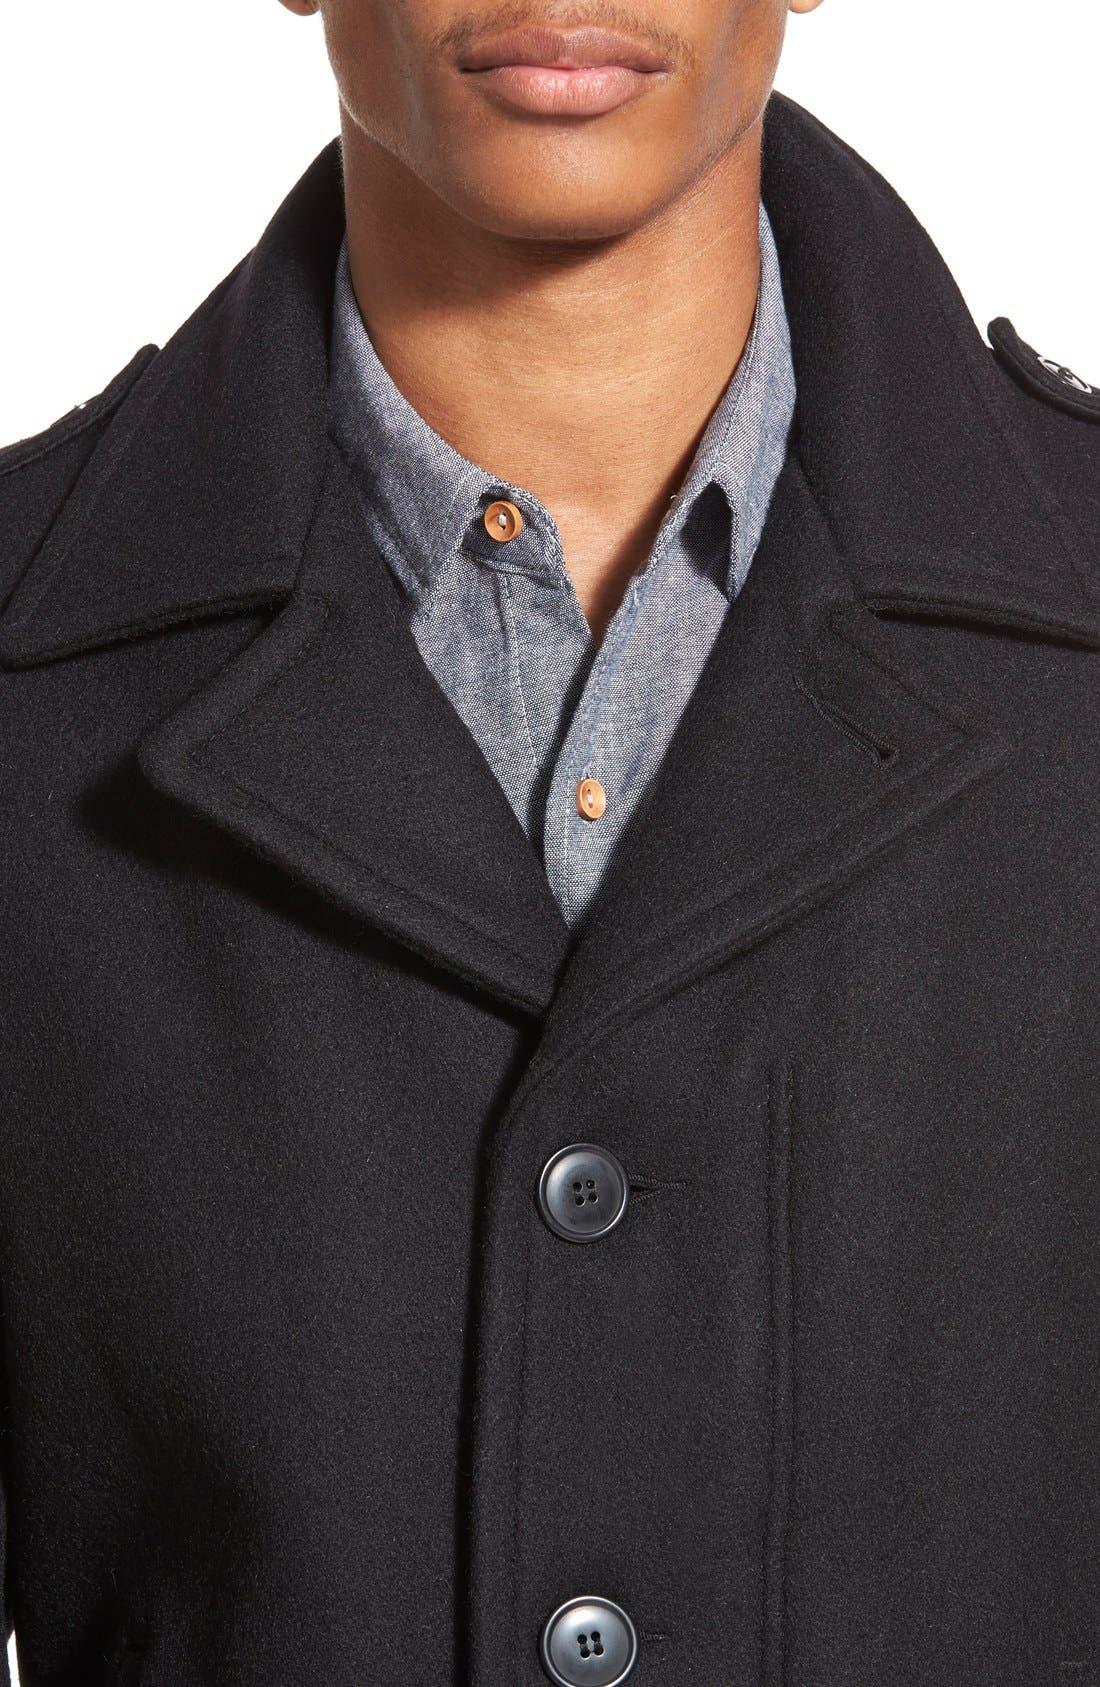 Slim Fit Wool Military Jacket,                             Alternate thumbnail 6, color,                             001